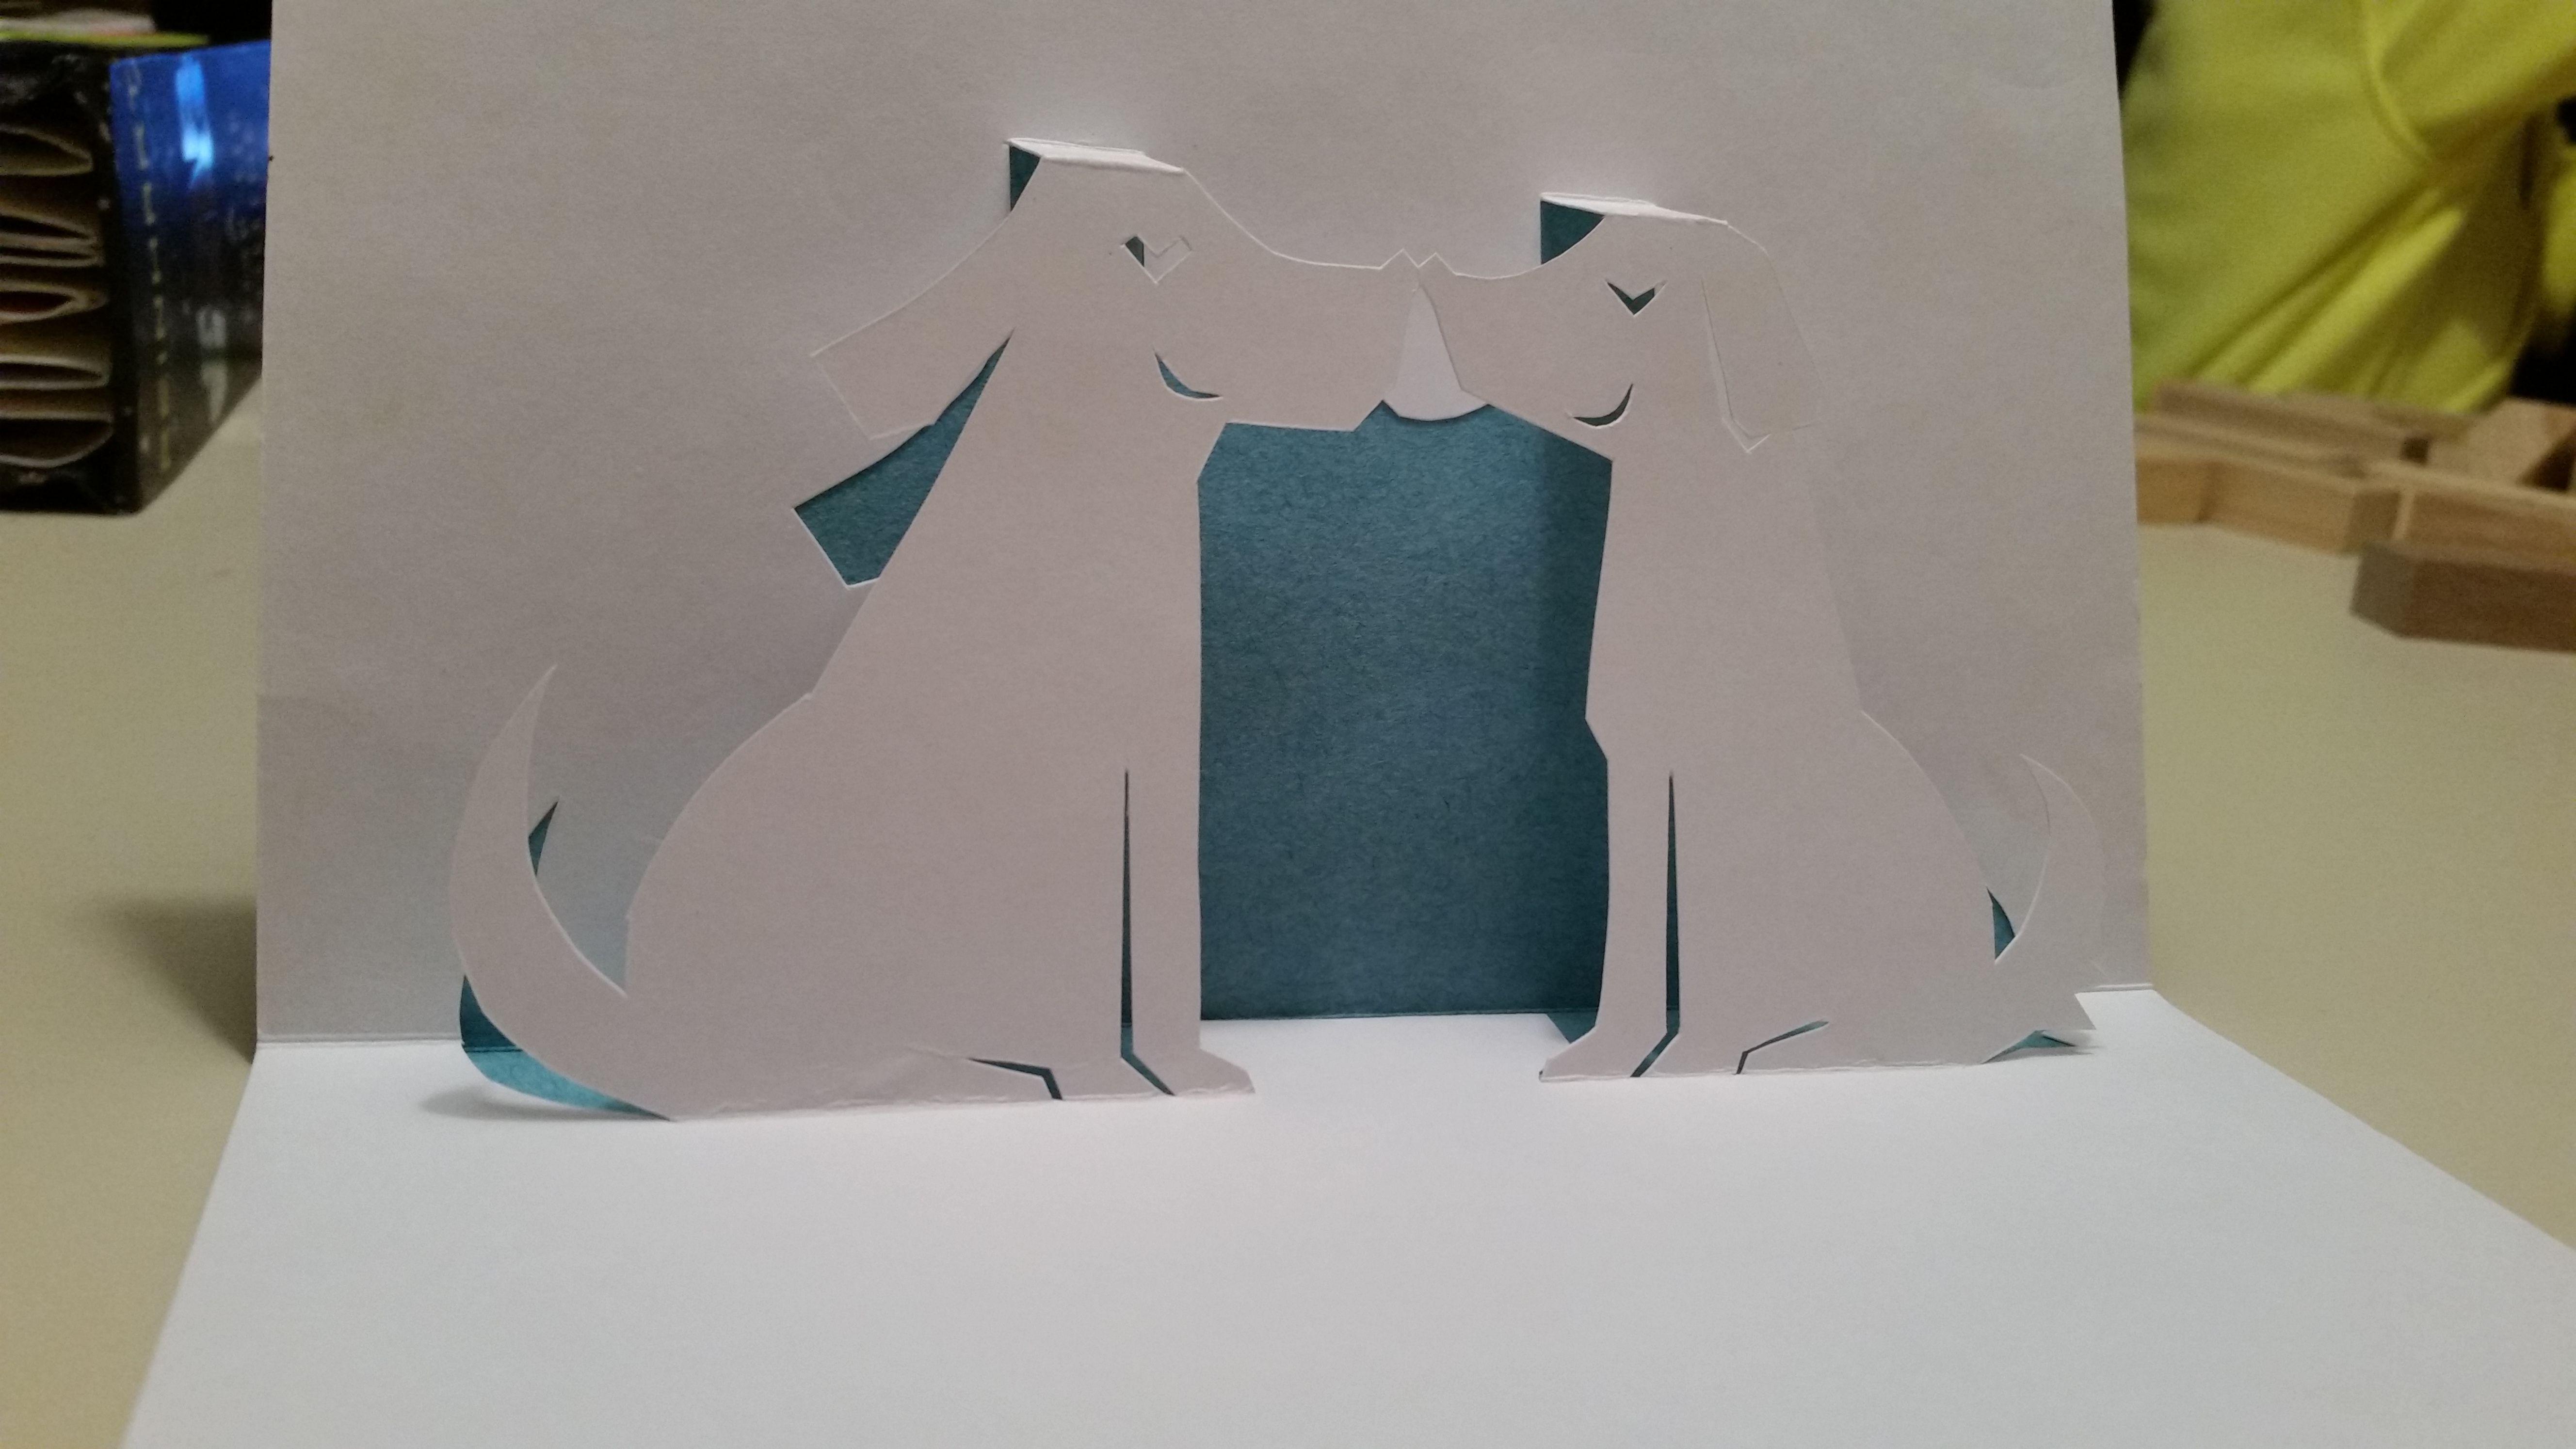 Two Dogs Pop Up Card Template From Handmade Papercraft Club At Http Www5d Biglobe Ne Jp M Uet 90dlpage Html Pop Up Card Templates Dog Pop Cards Handmade